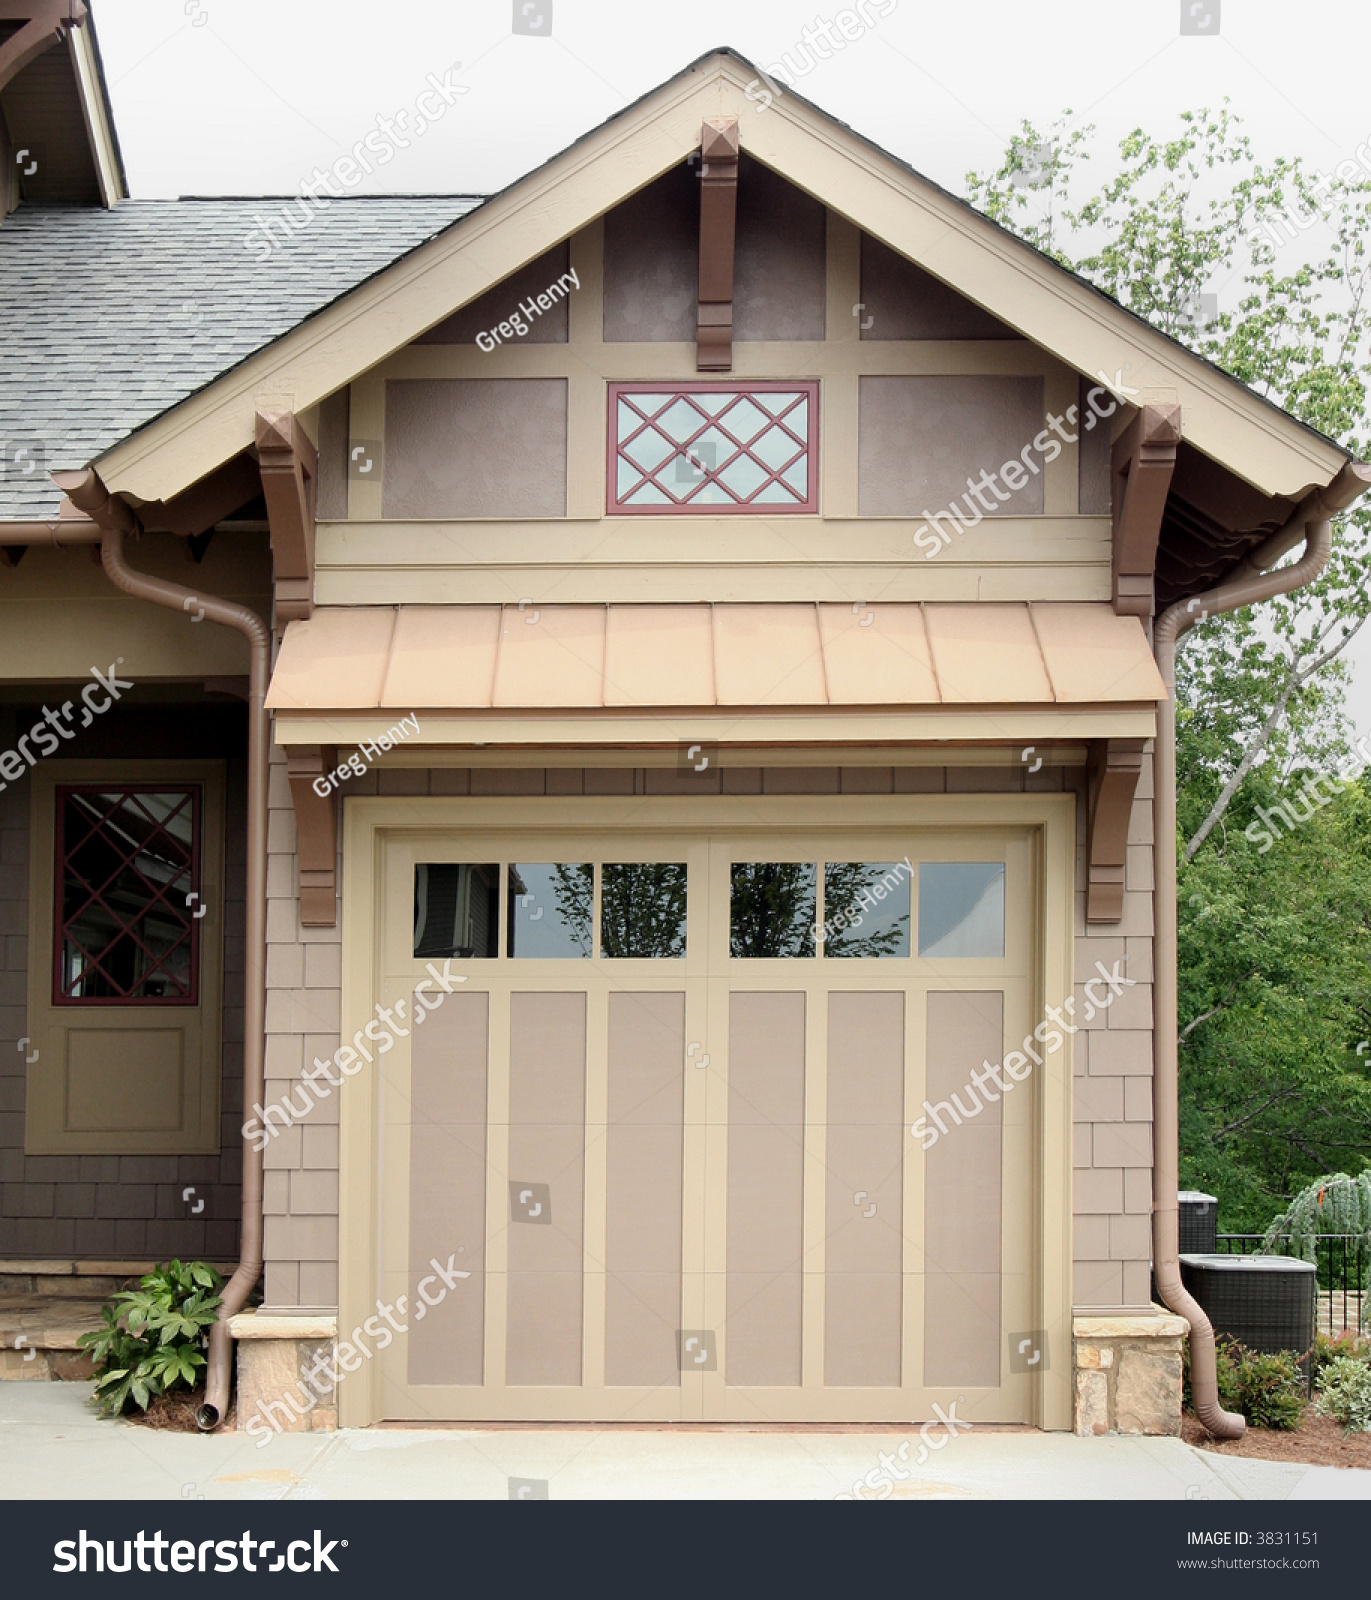 Craftsman Style Det Garage Garage: Craftsman Style Garage. Transportation Storage. Stock